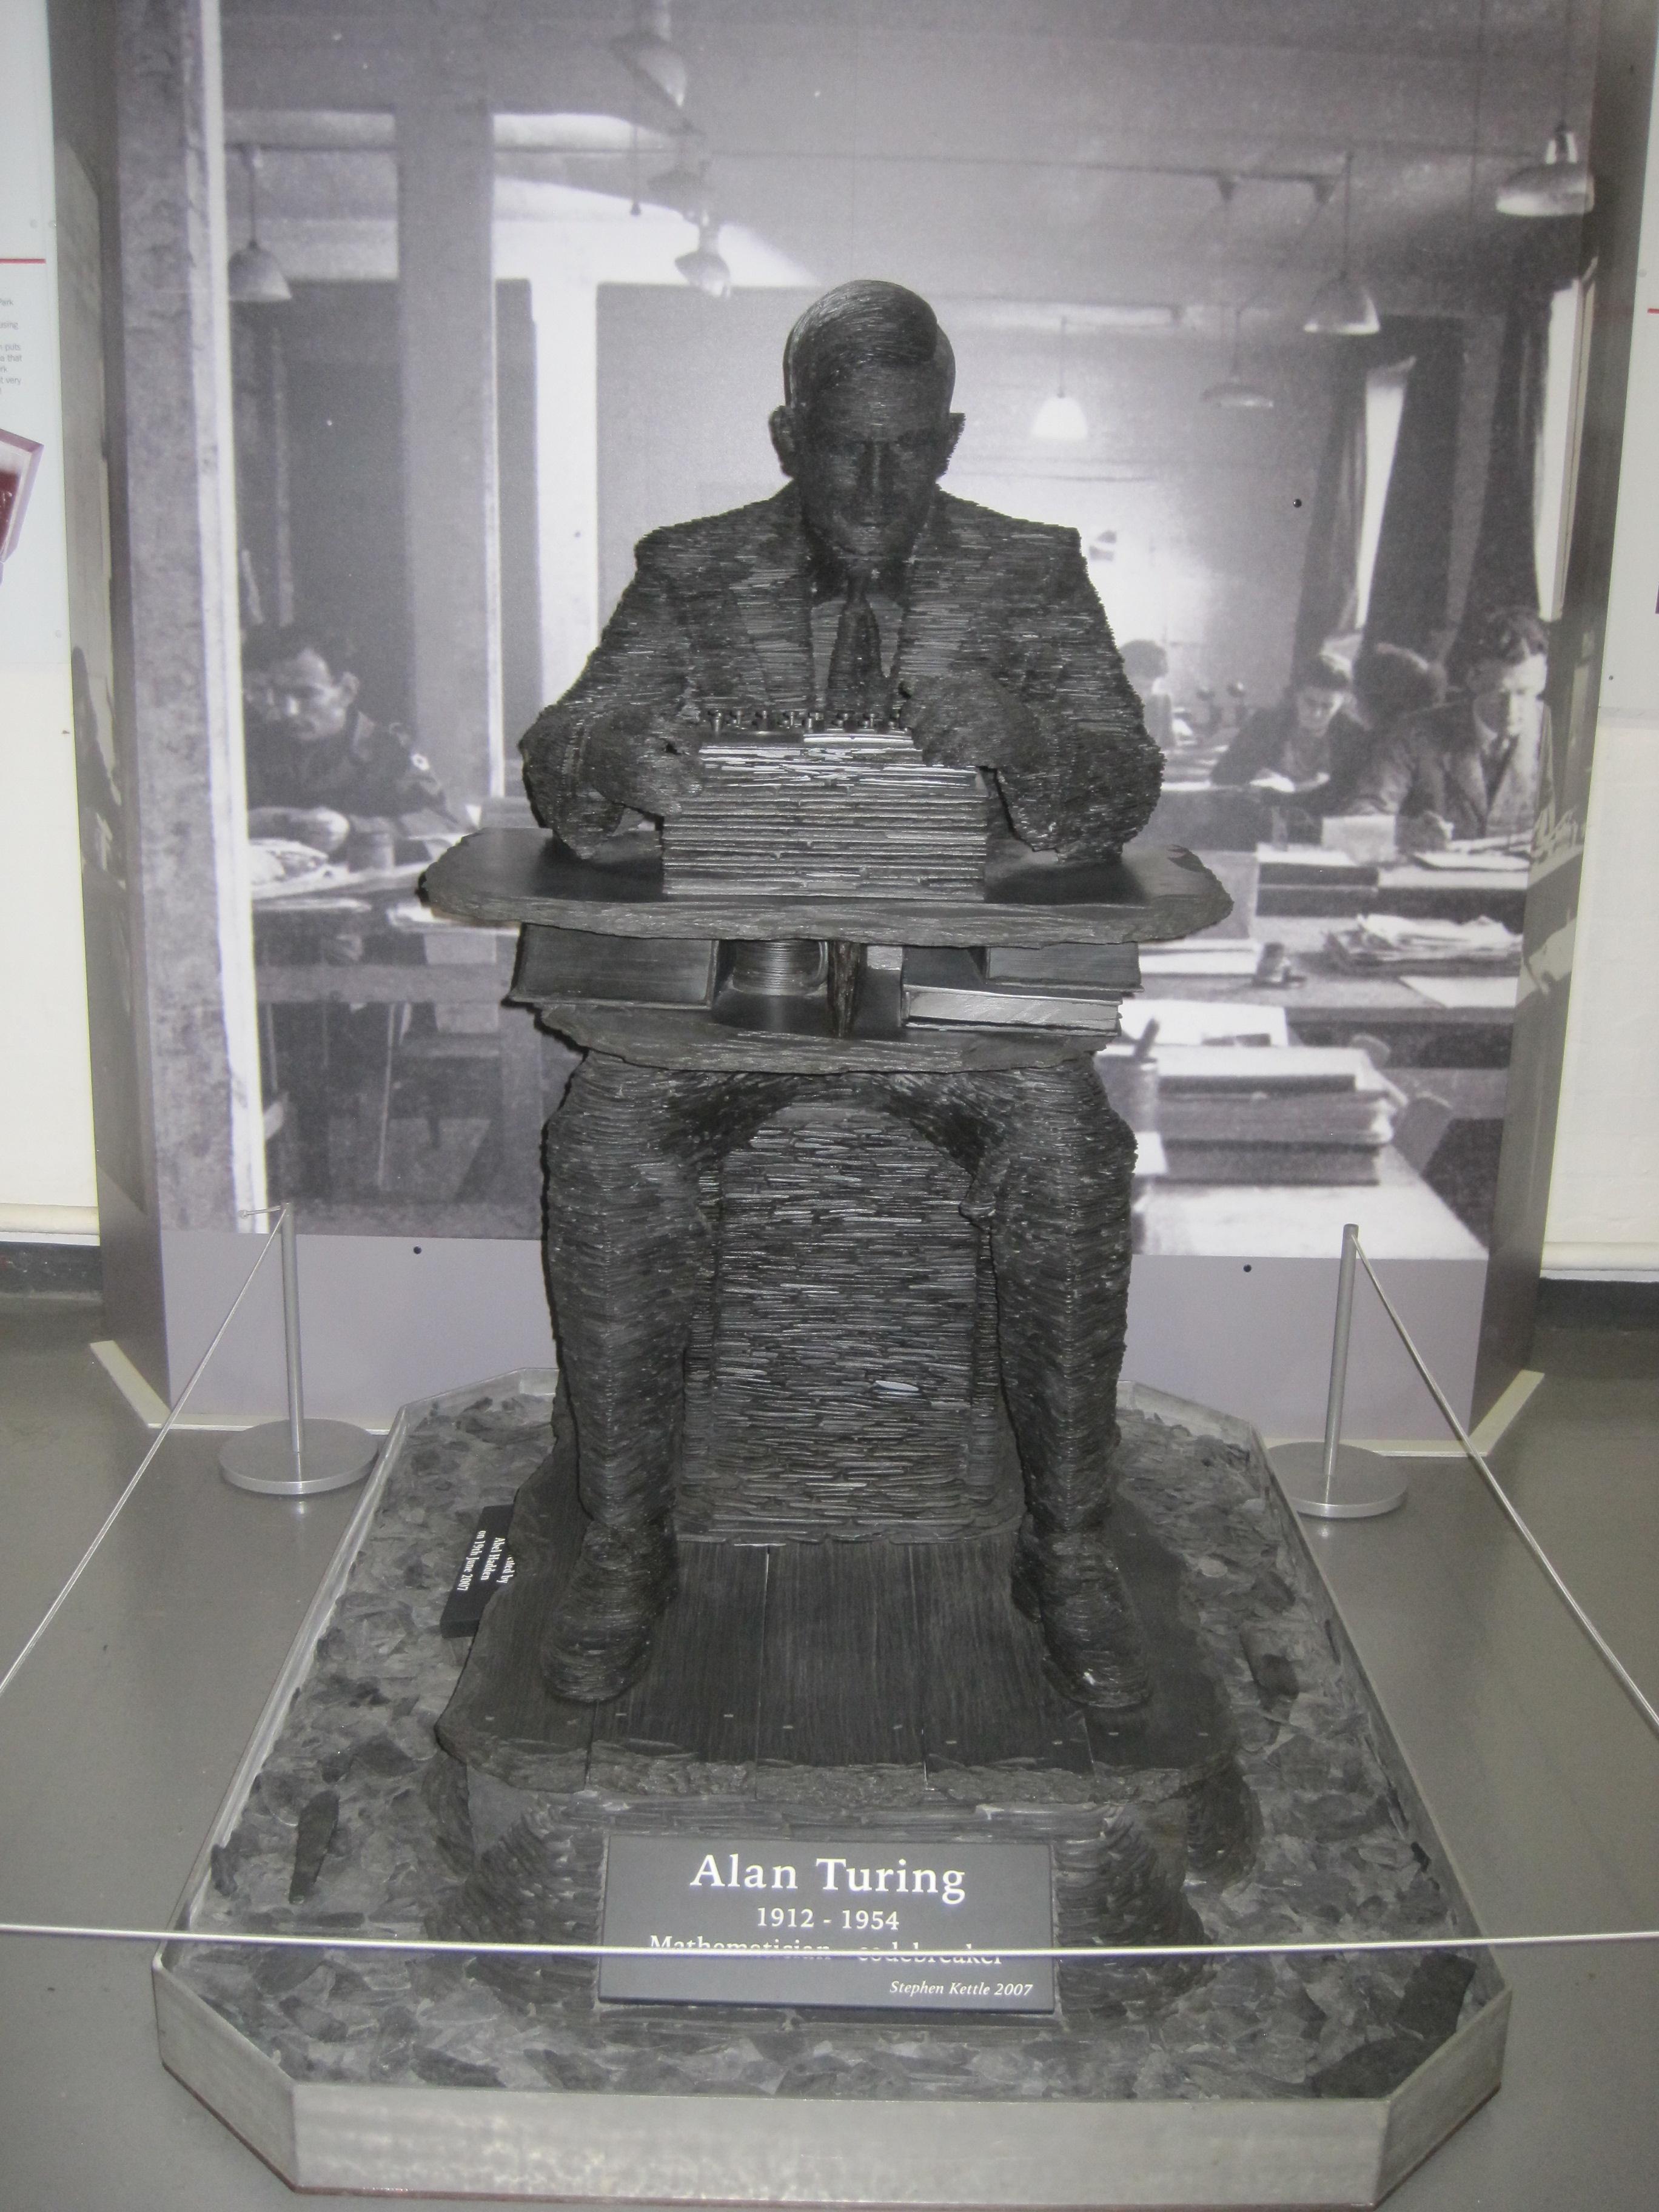 Statue of Alan Turing - Photo by Juliamaud